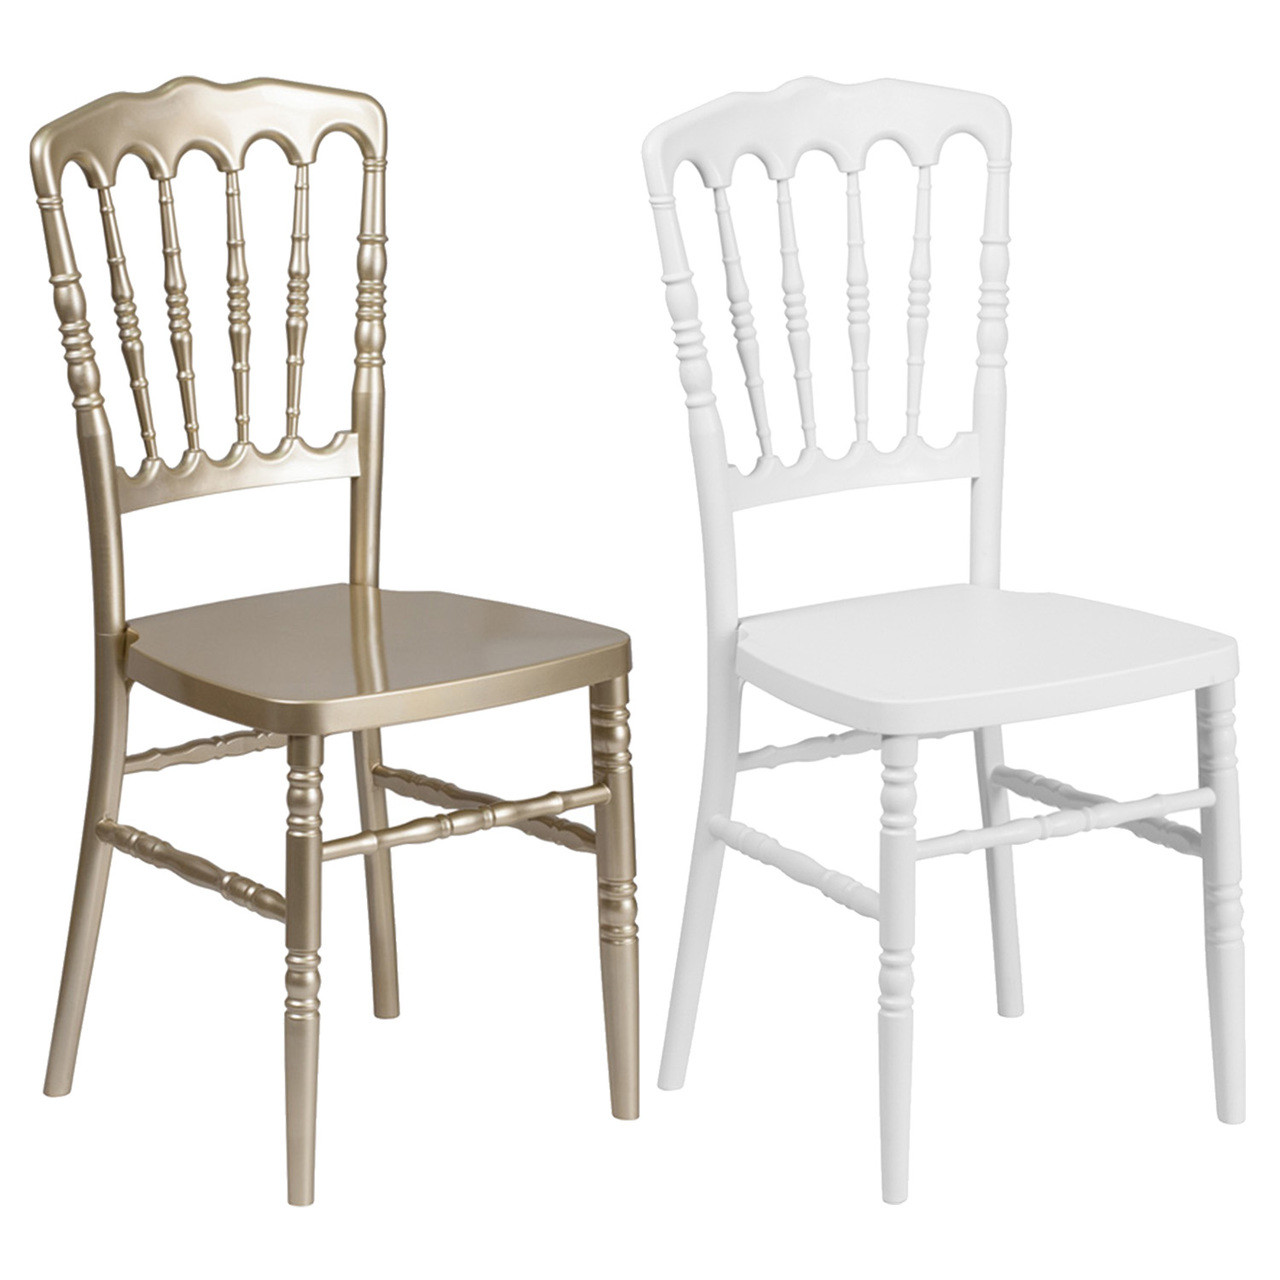 Napoleon Resin Stacking Chair Foldingchairsandtables Com